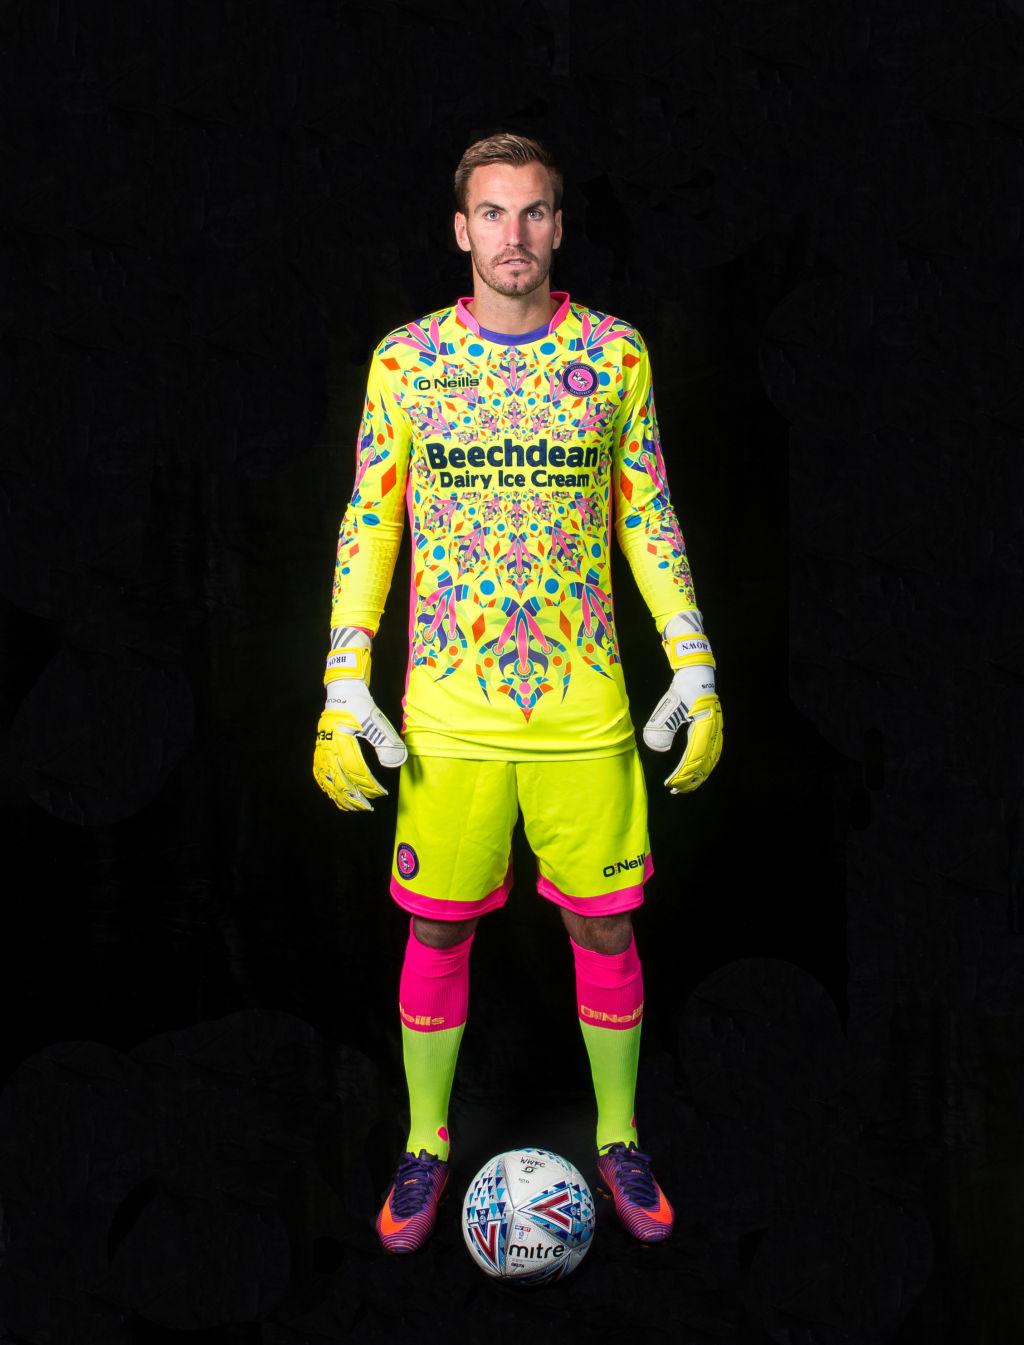 This luminous goalkeeper